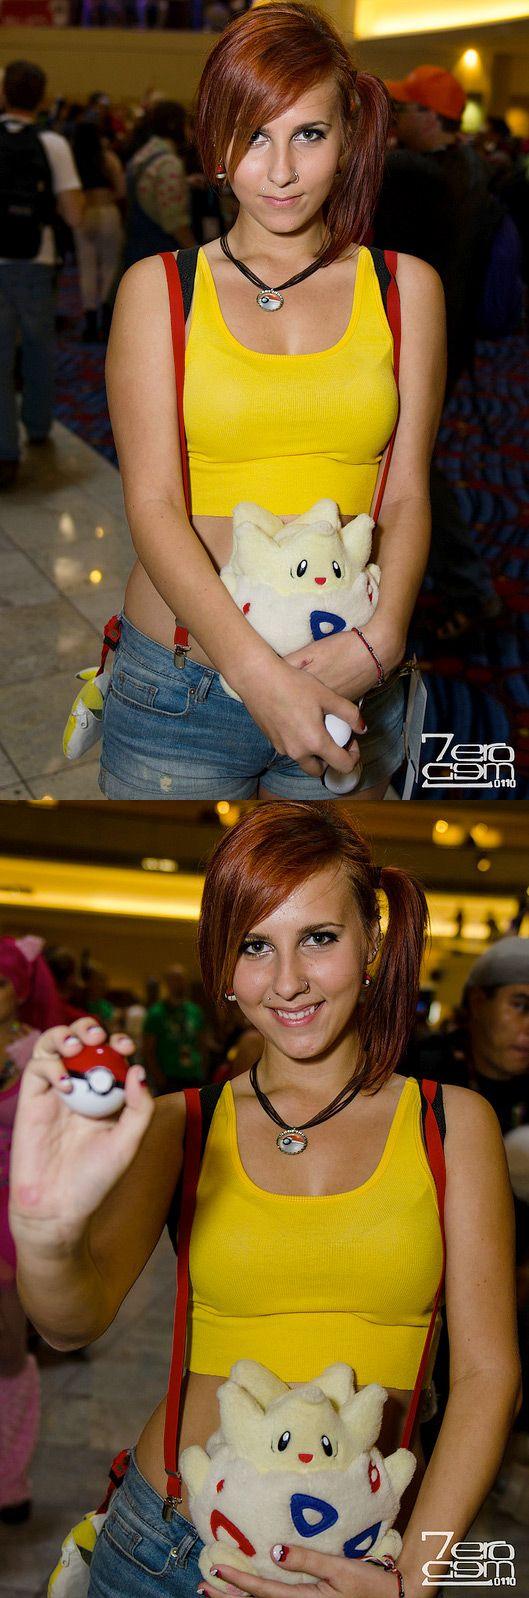 Misty from Pokemon | Dragon*Con 2012